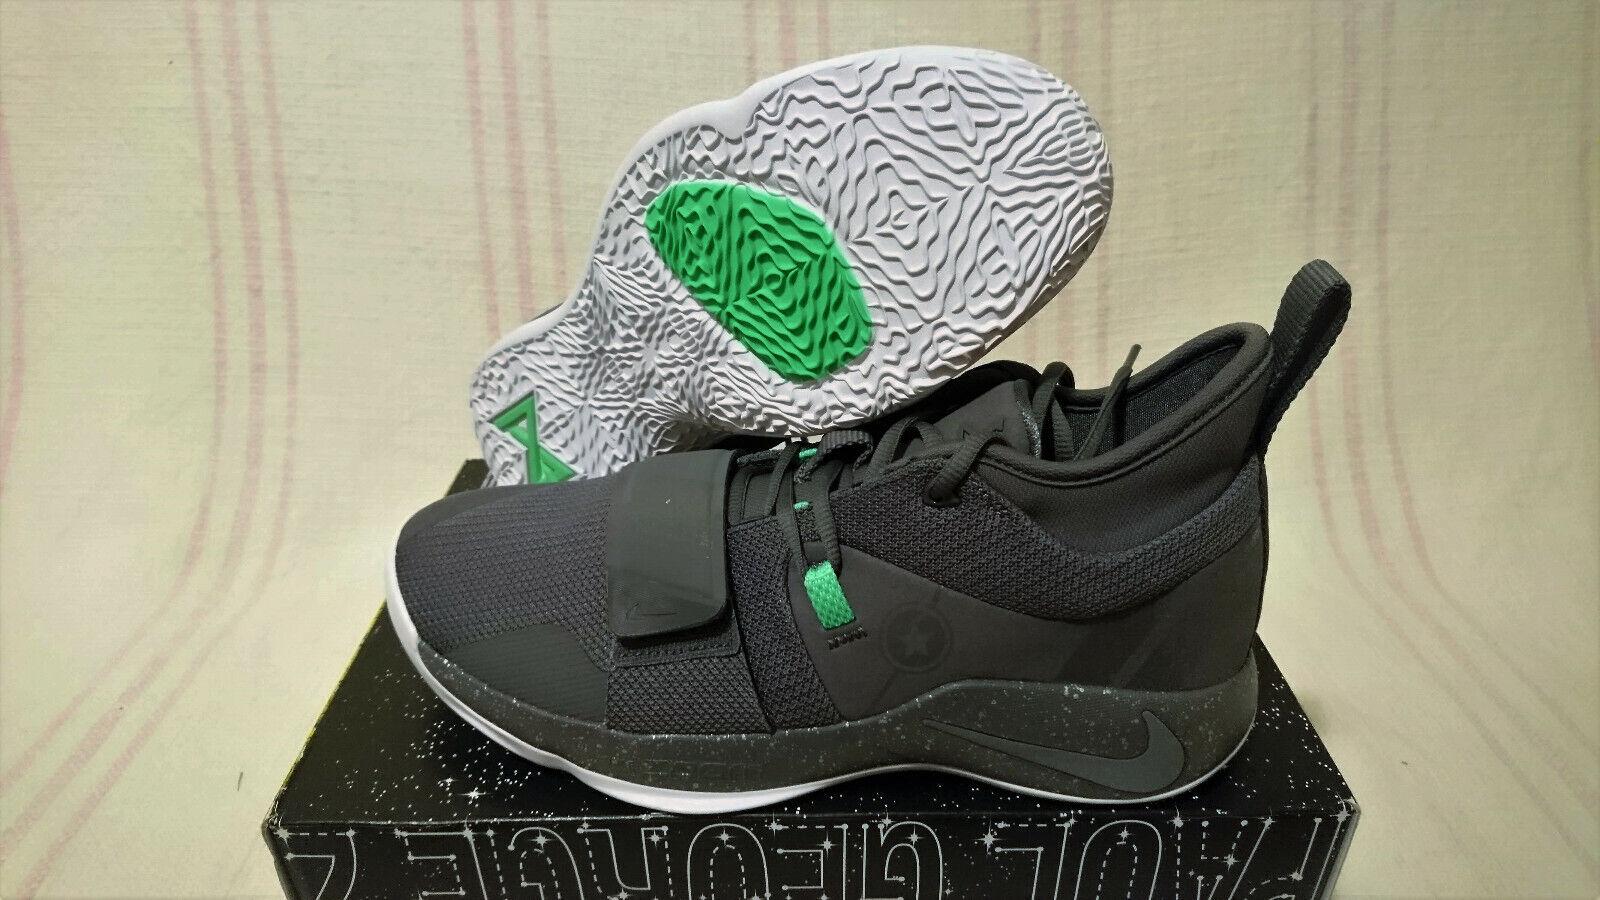 Nike PG 2.5 купить на eBay в Америке